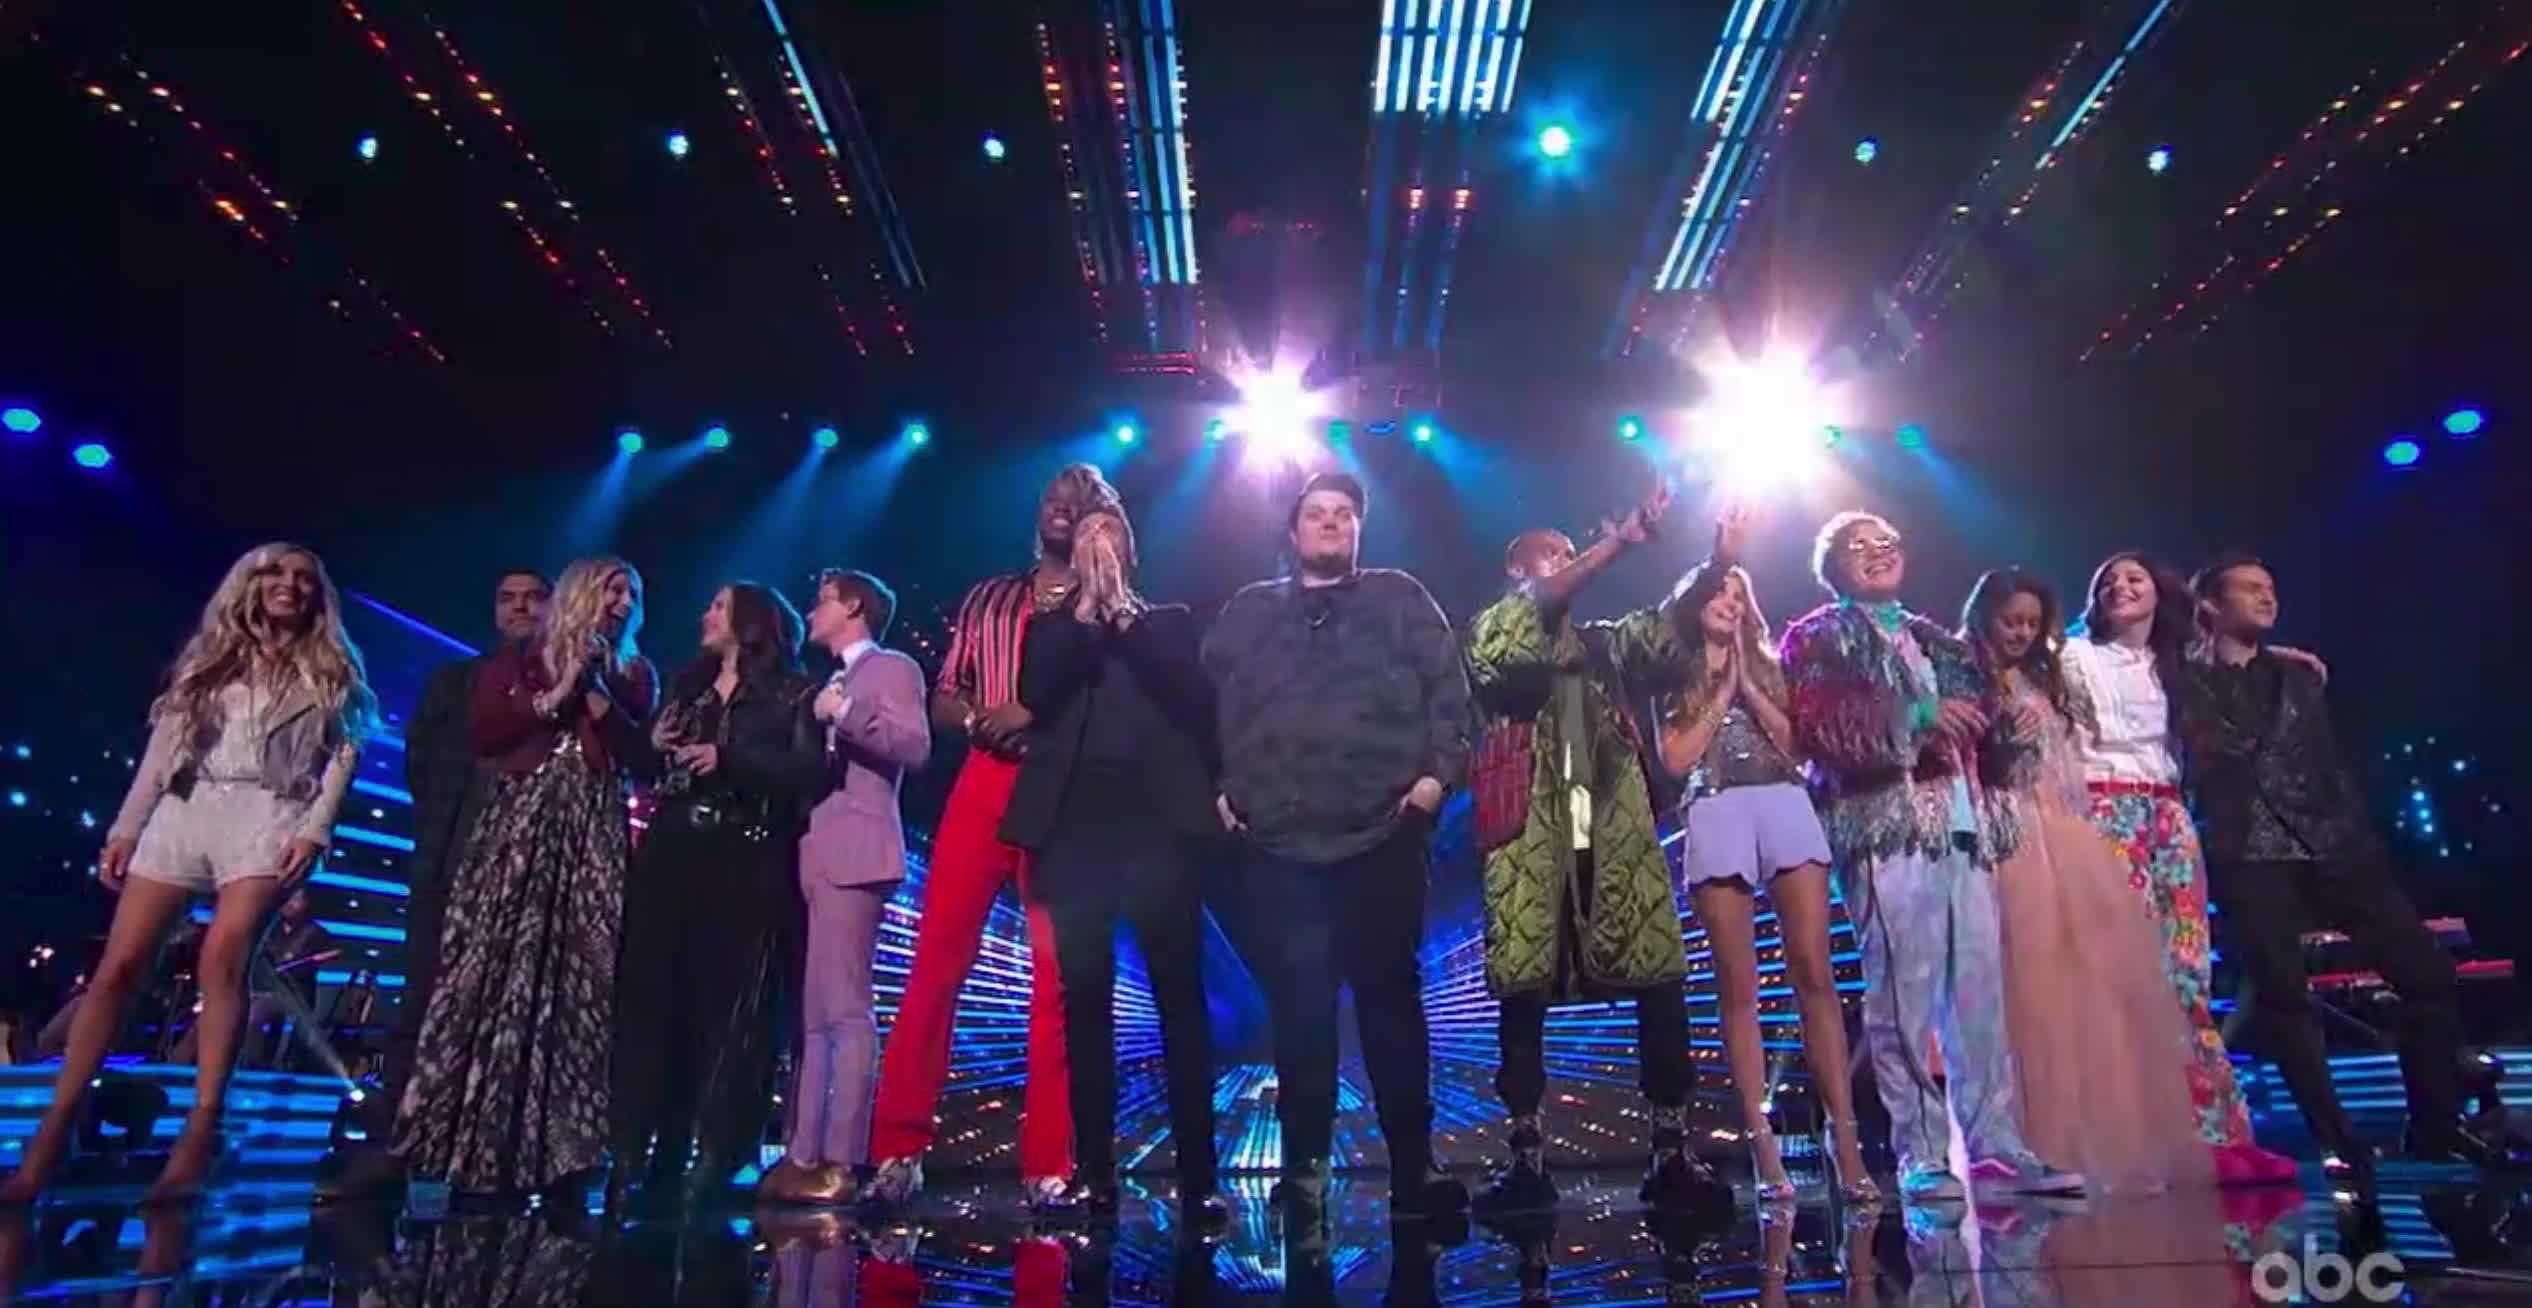 american idol, american idol season 17, americanidol, katy perry, lionel richie, luke bryan, ryan seacrest, season 17, singing, American Idol Ryan and The Top 14 Contestants GIFs